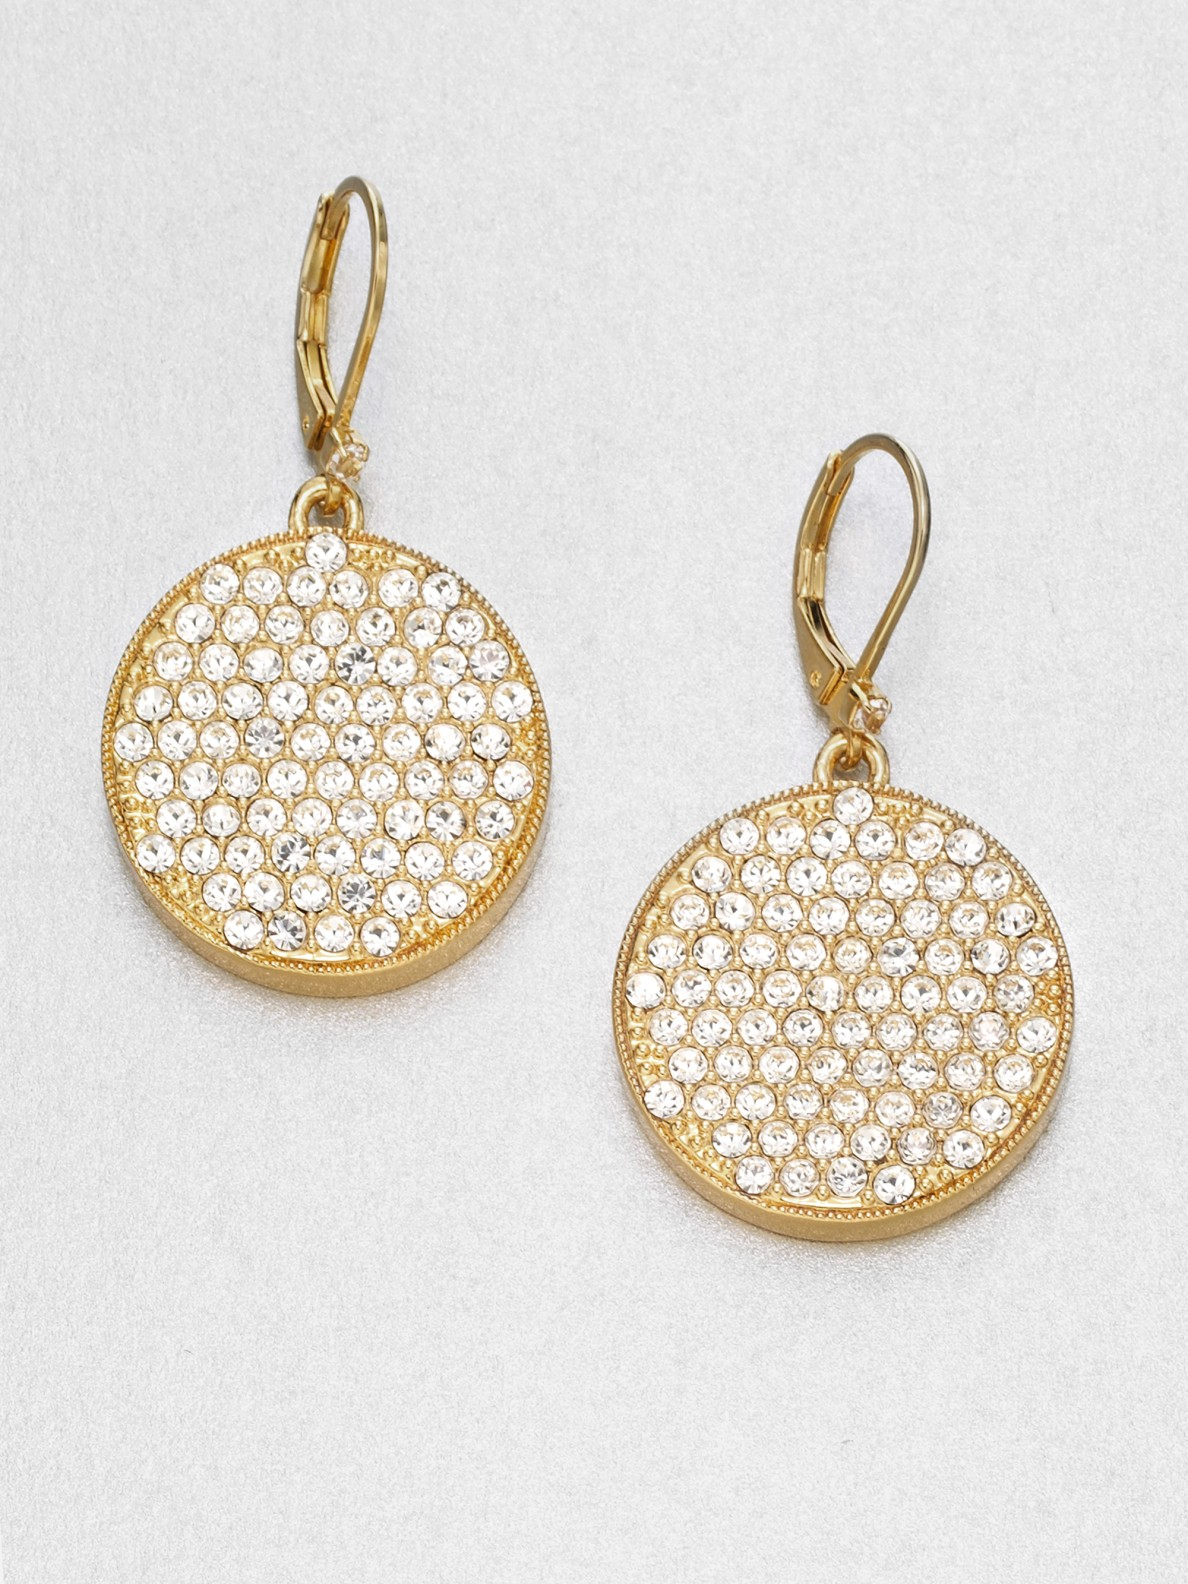 14k Rose Gold Pave Set Diamond Disk Source Lyst Kate Spade New York Pav Disc Drop Earrings In Metallic